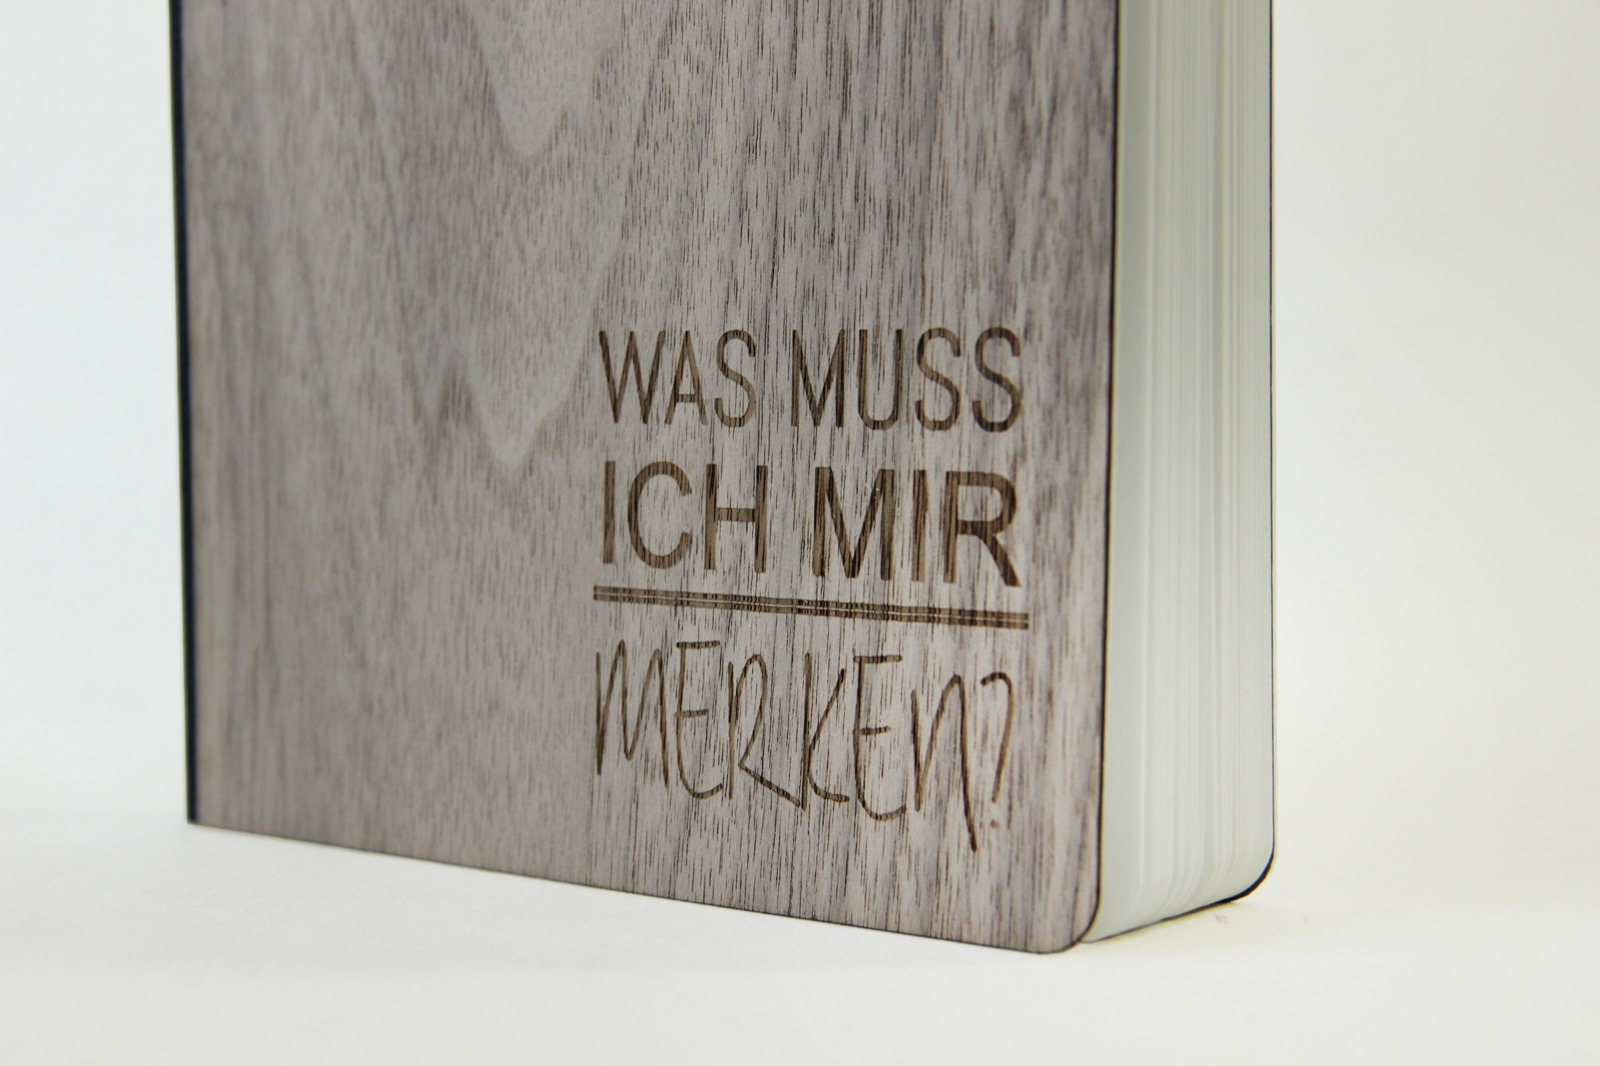 Notizbuch Merken